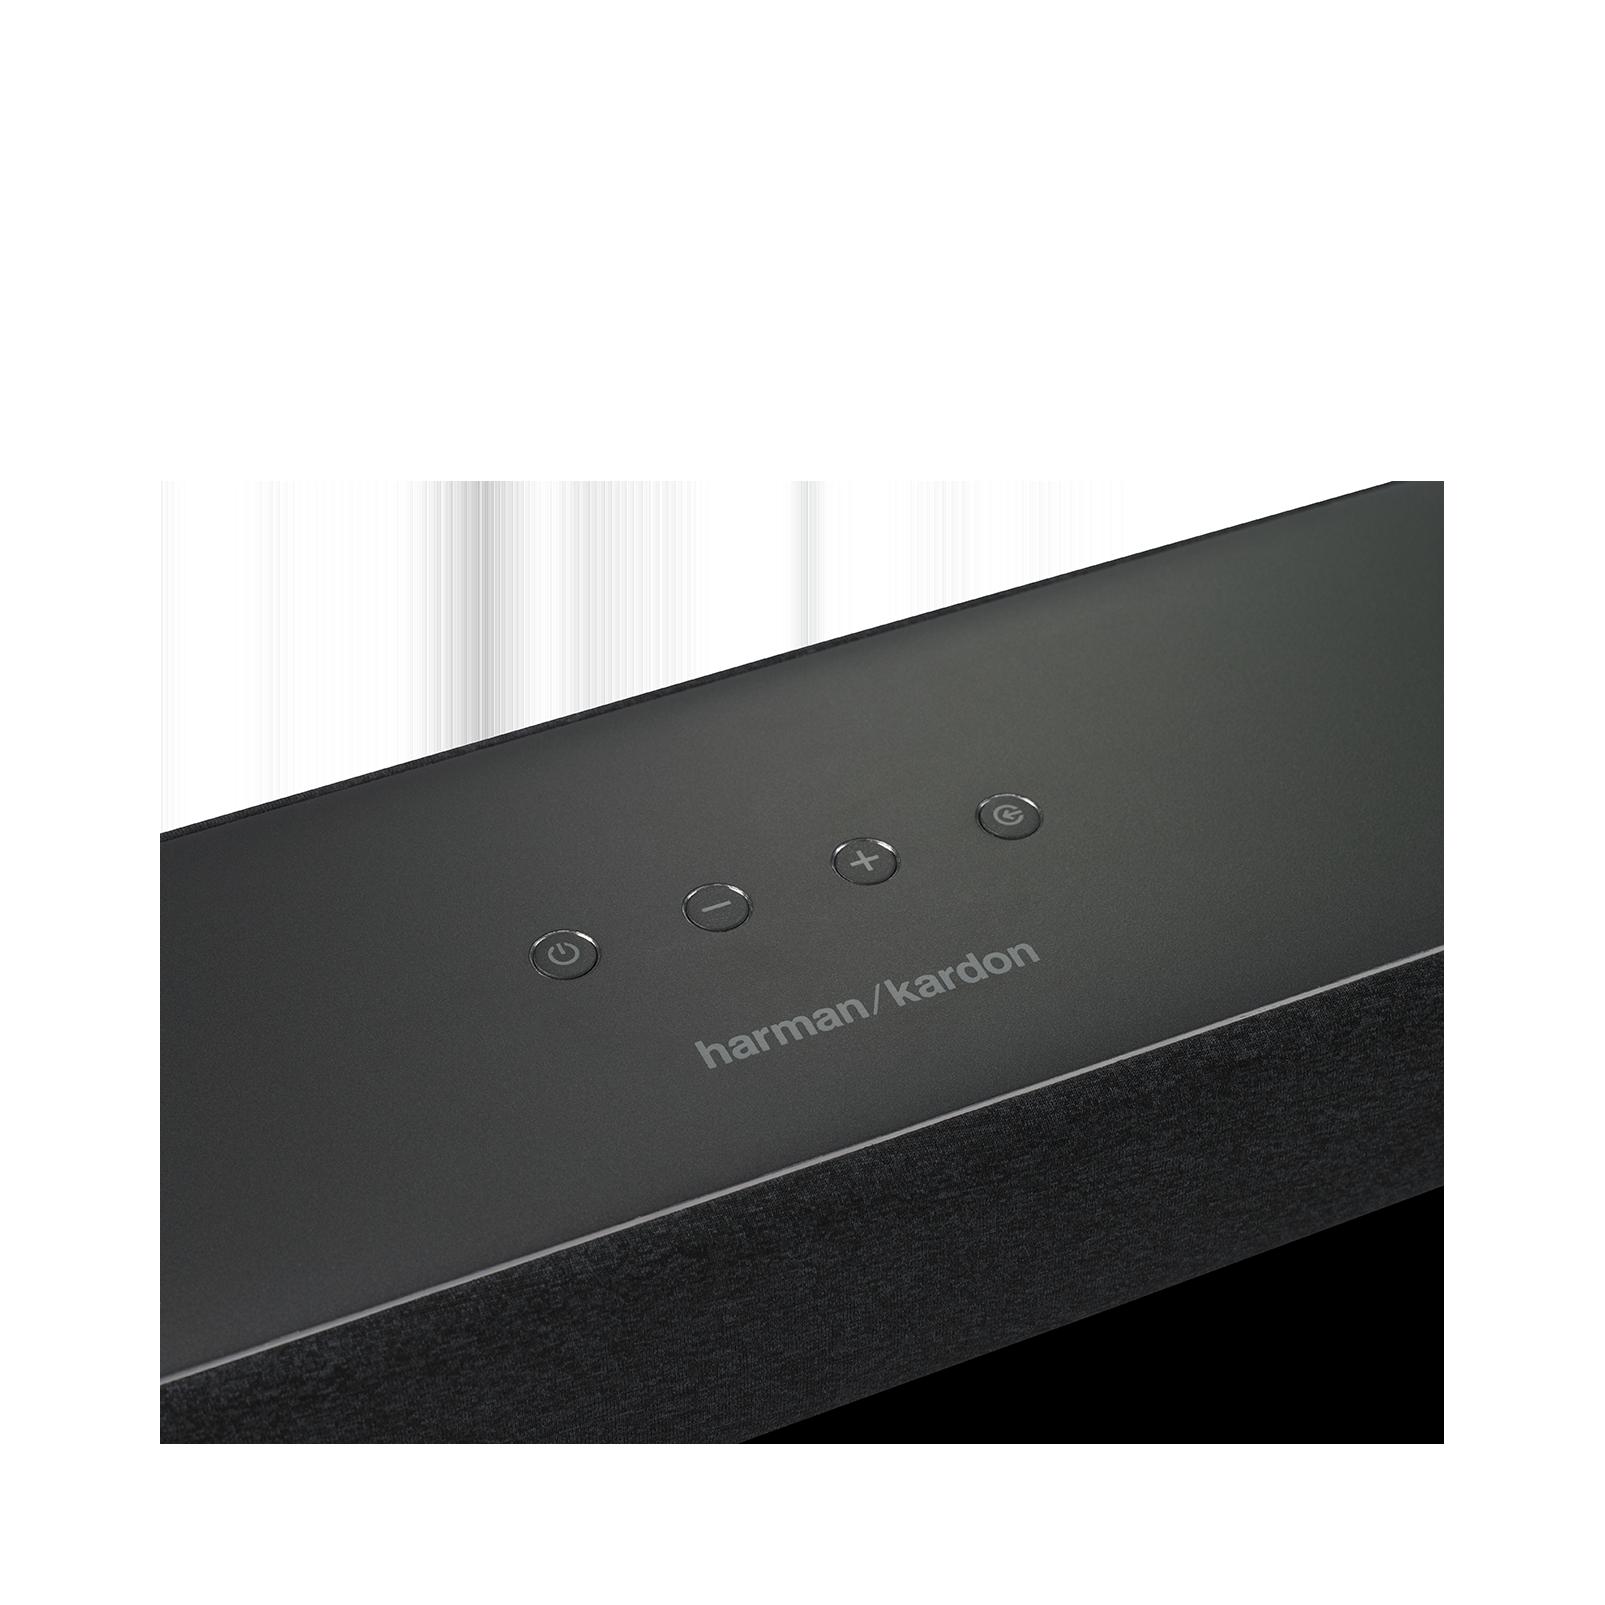 Enchant 800 - Graphite - All in One 8-Channel Soundbar with MultiBeam™ Surround Sound - Detailshot 2